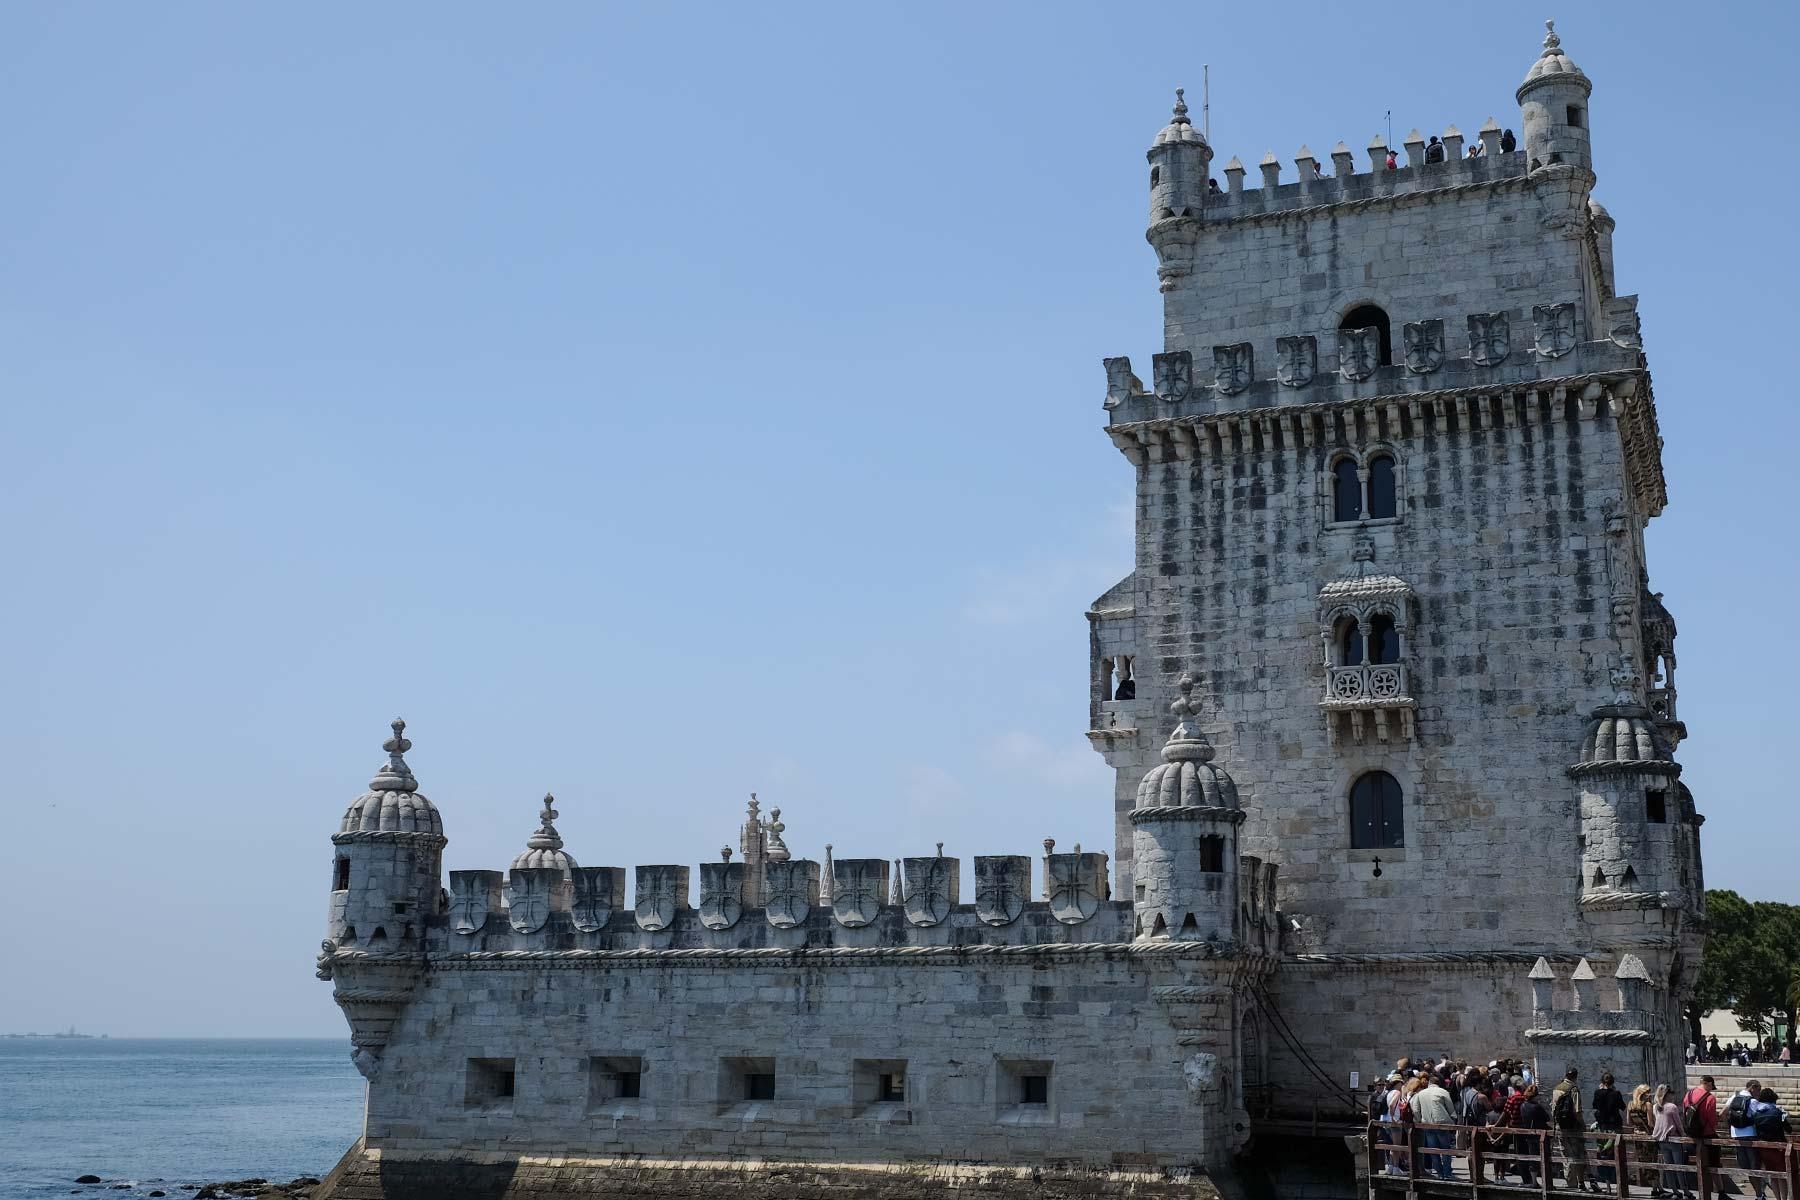 Torre de Belém in Lissabon, Portugal